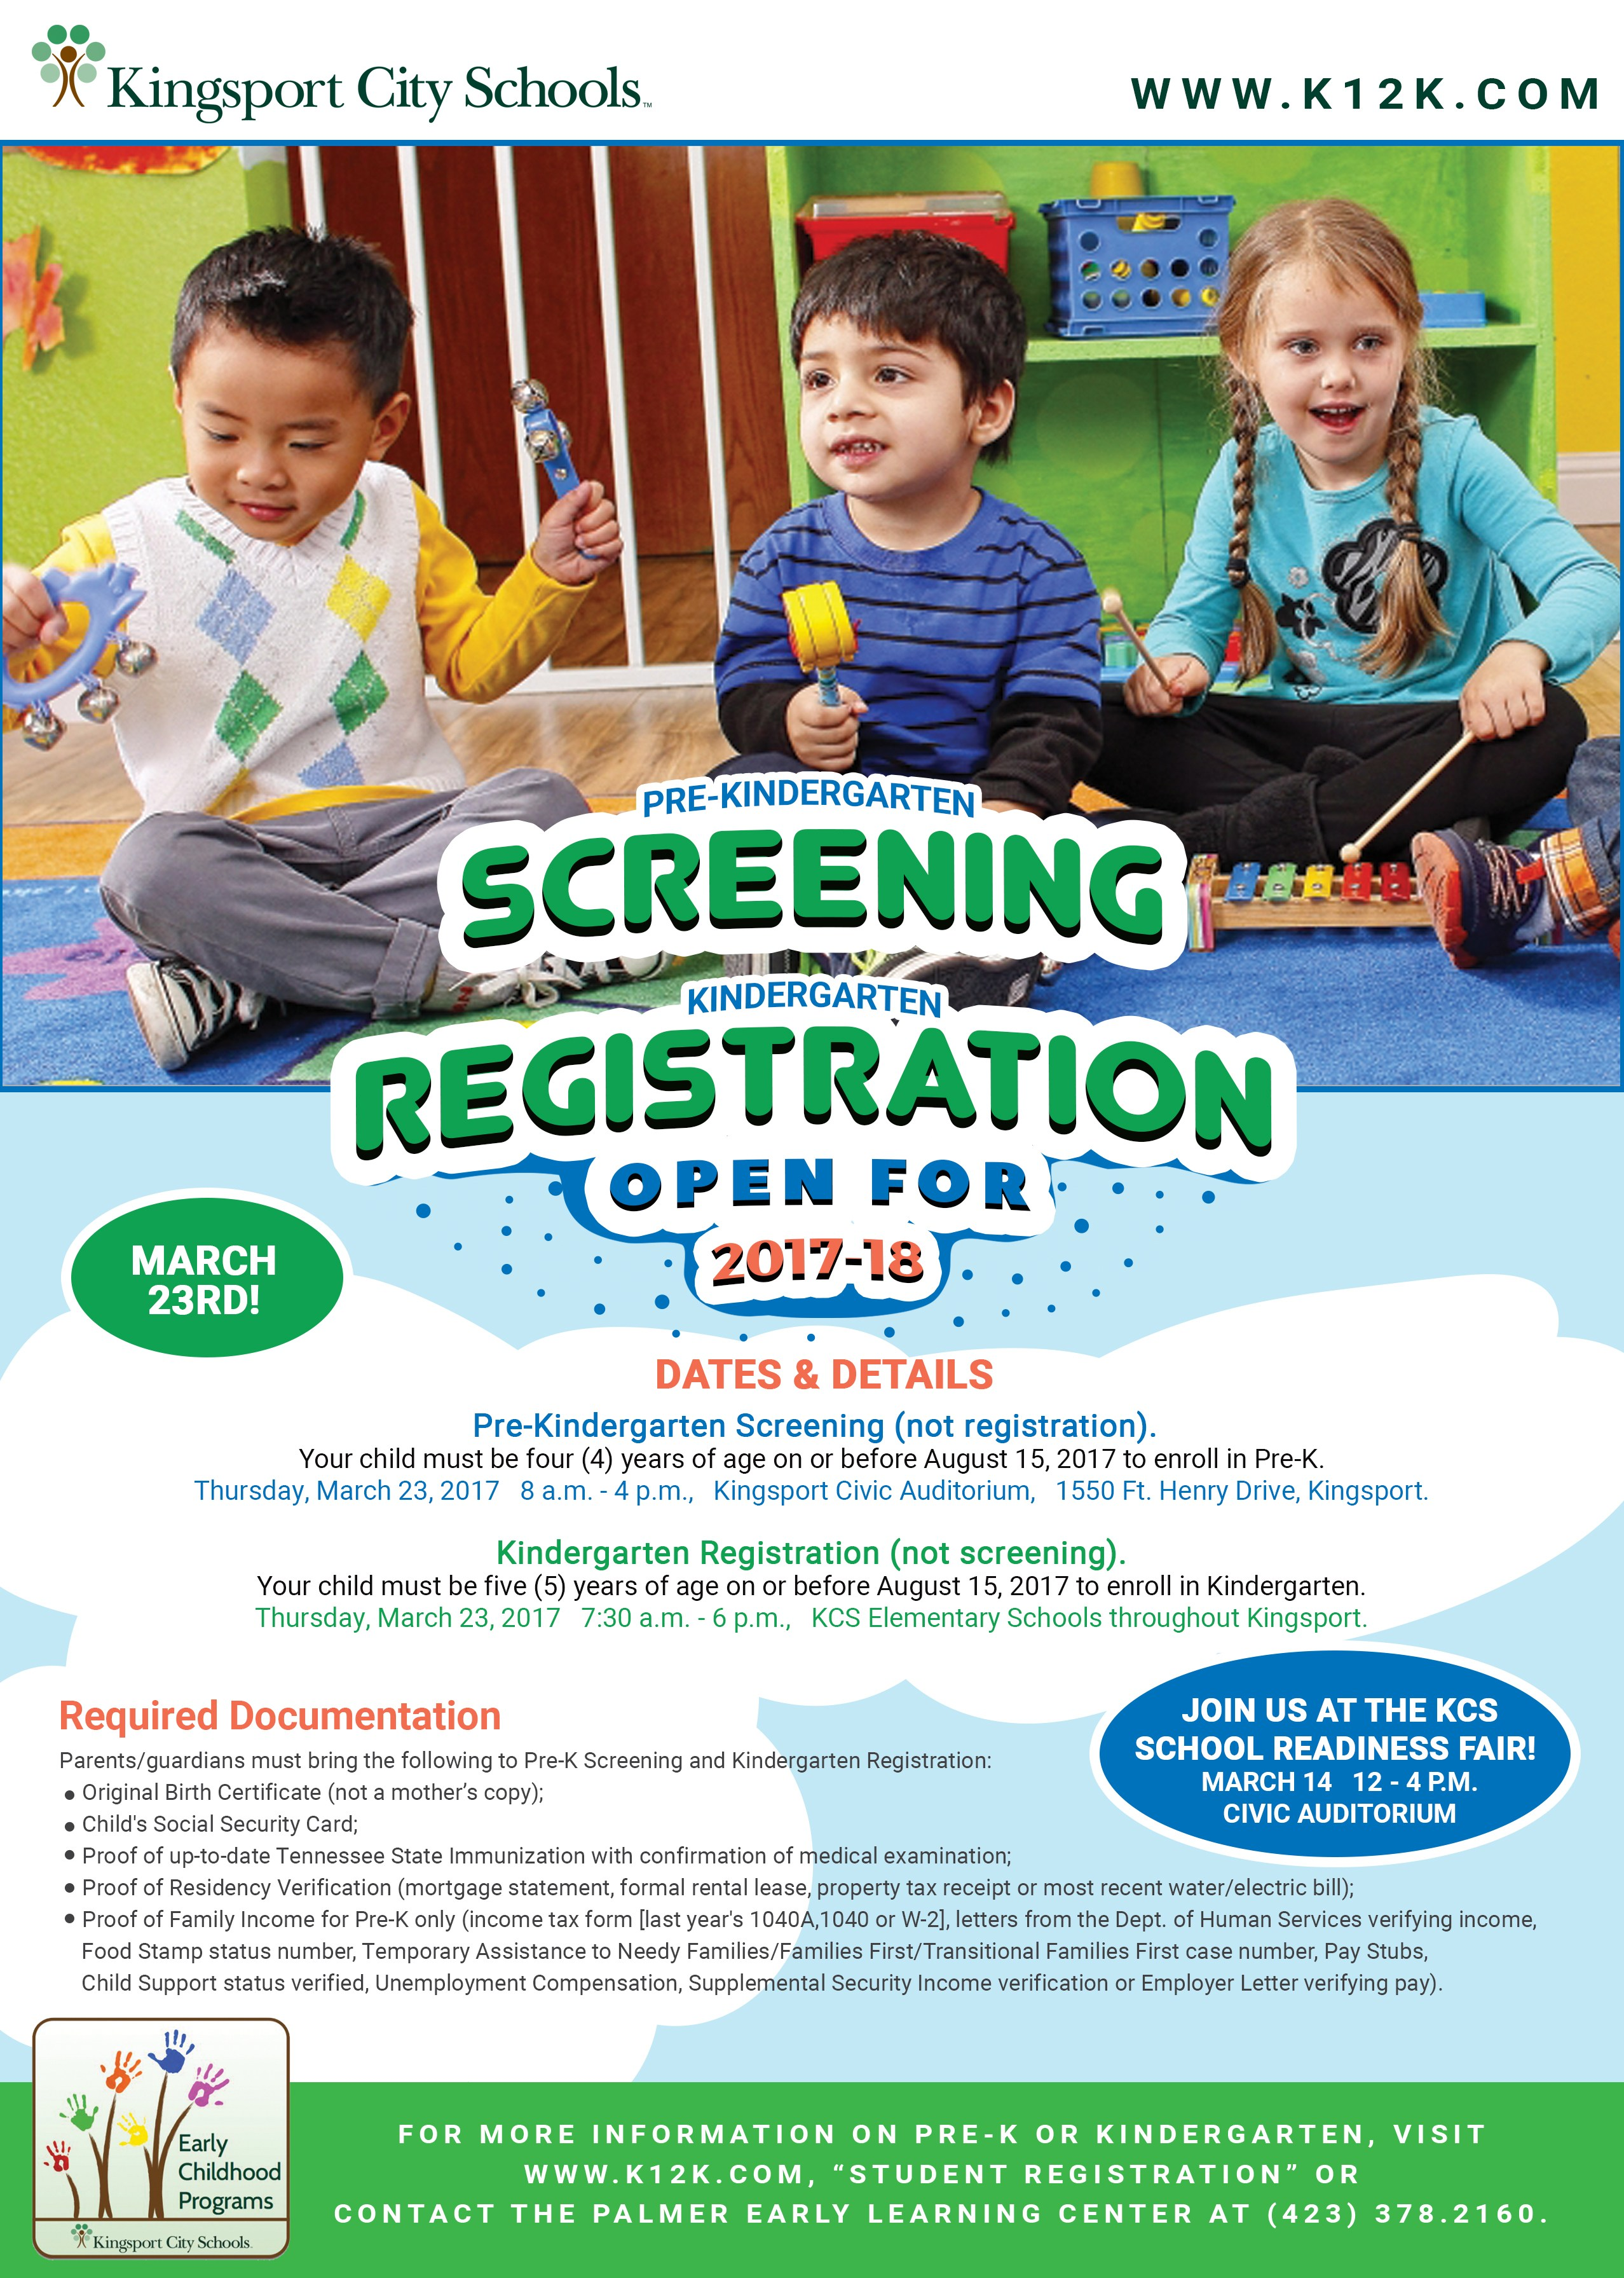 Kingsport City Schools Pre-K Screenings and Kindergarten Registration to be  Held for 2017-2018 School Year